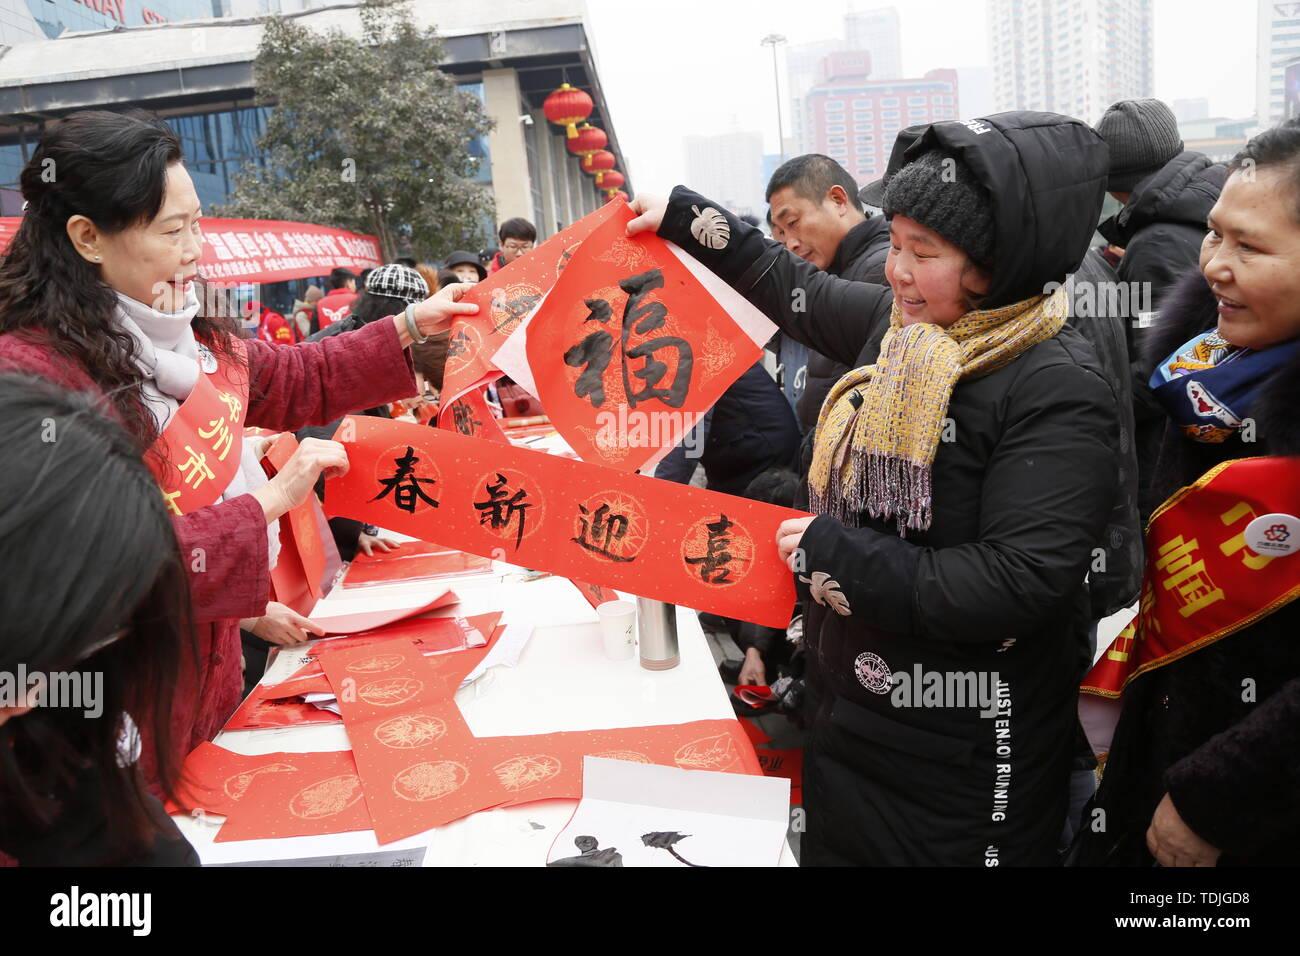 On January 28, 2019, the East Plaza of Zhengzhou Railway Station